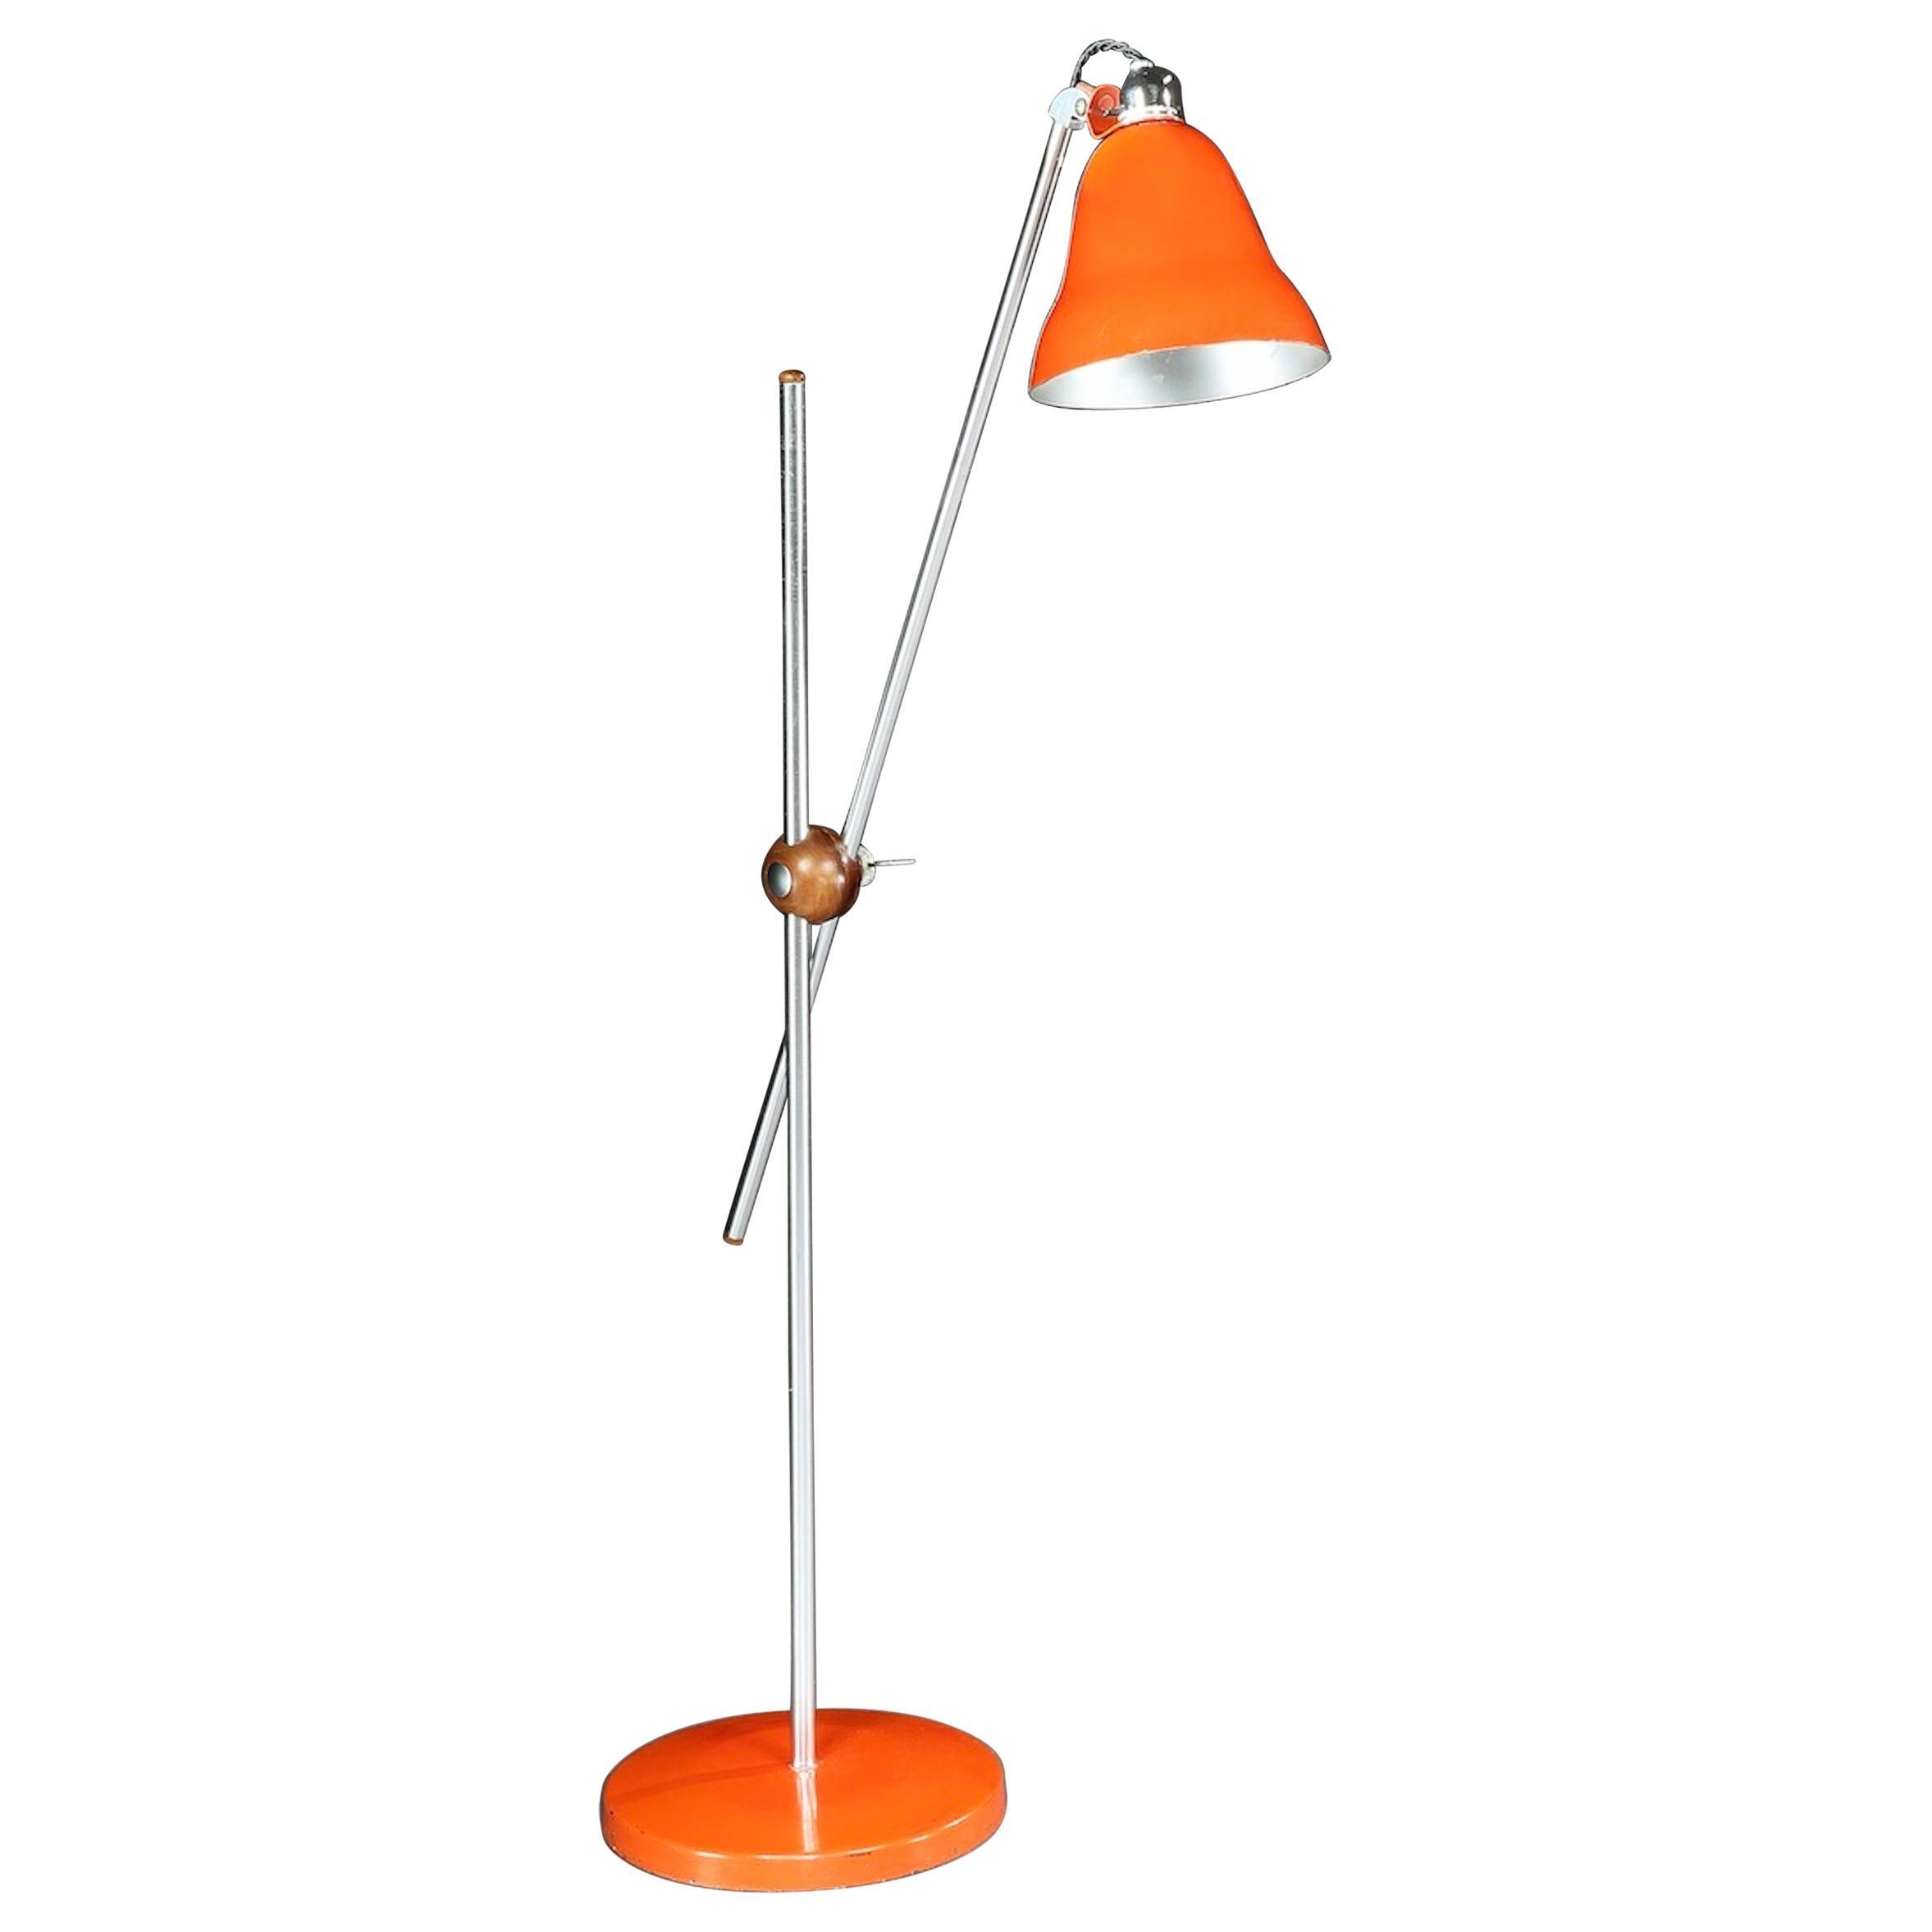 Lamp Floor Standing Reading 1960 Enameled Chrome Wood Original Shade Extending For Sale At 1stdibs